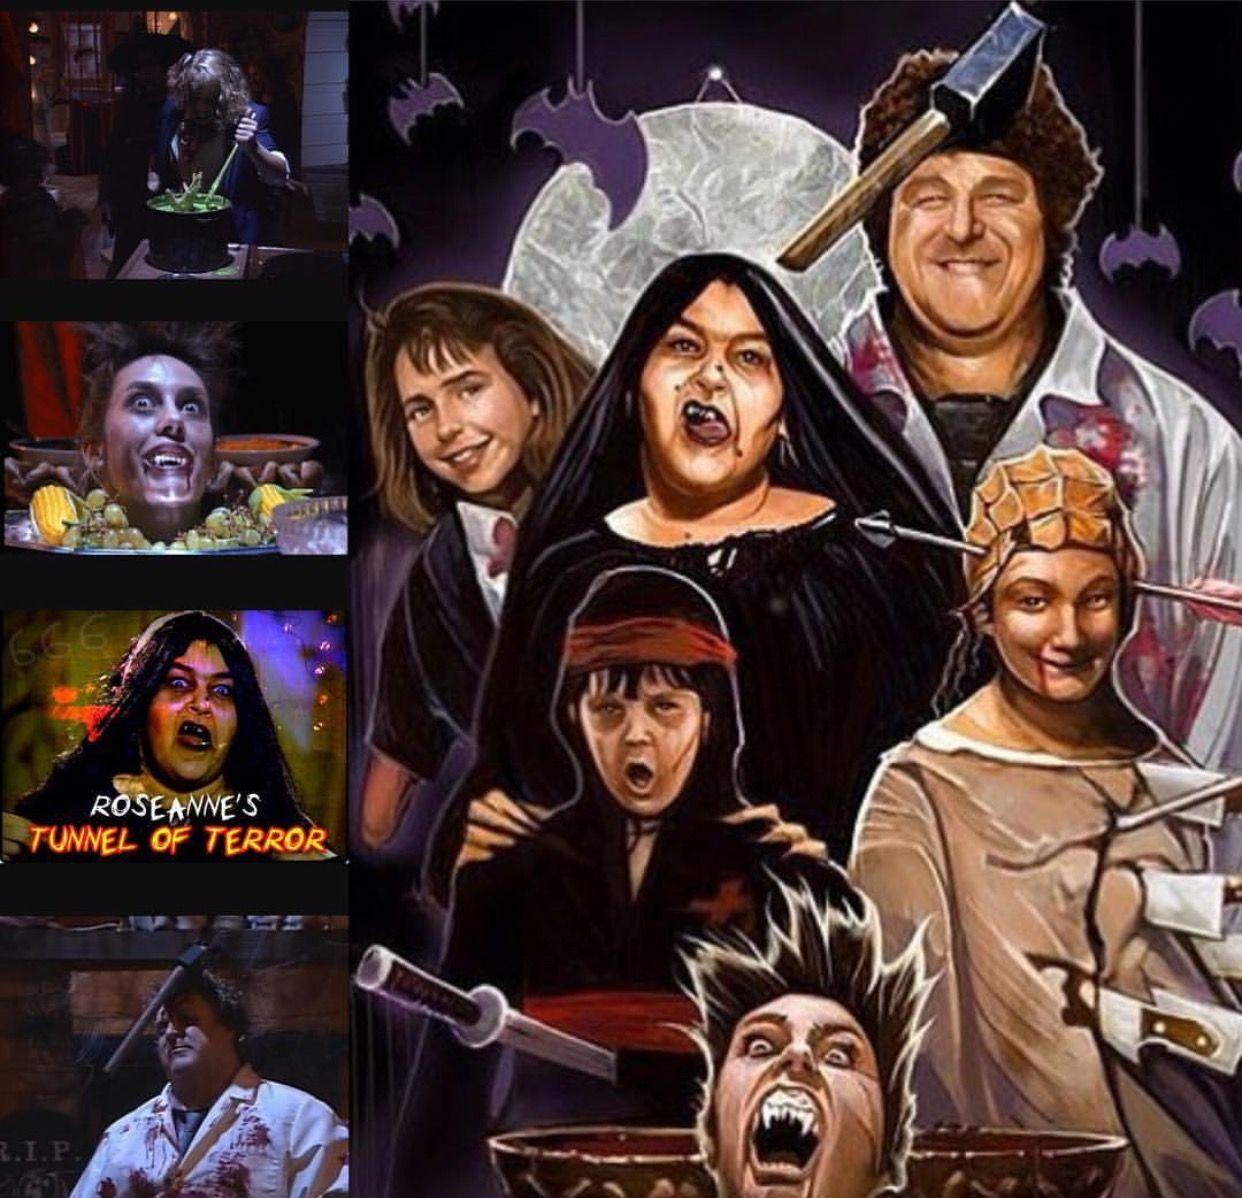 Roseanne Halloween episodes, Roseanne show, Horror